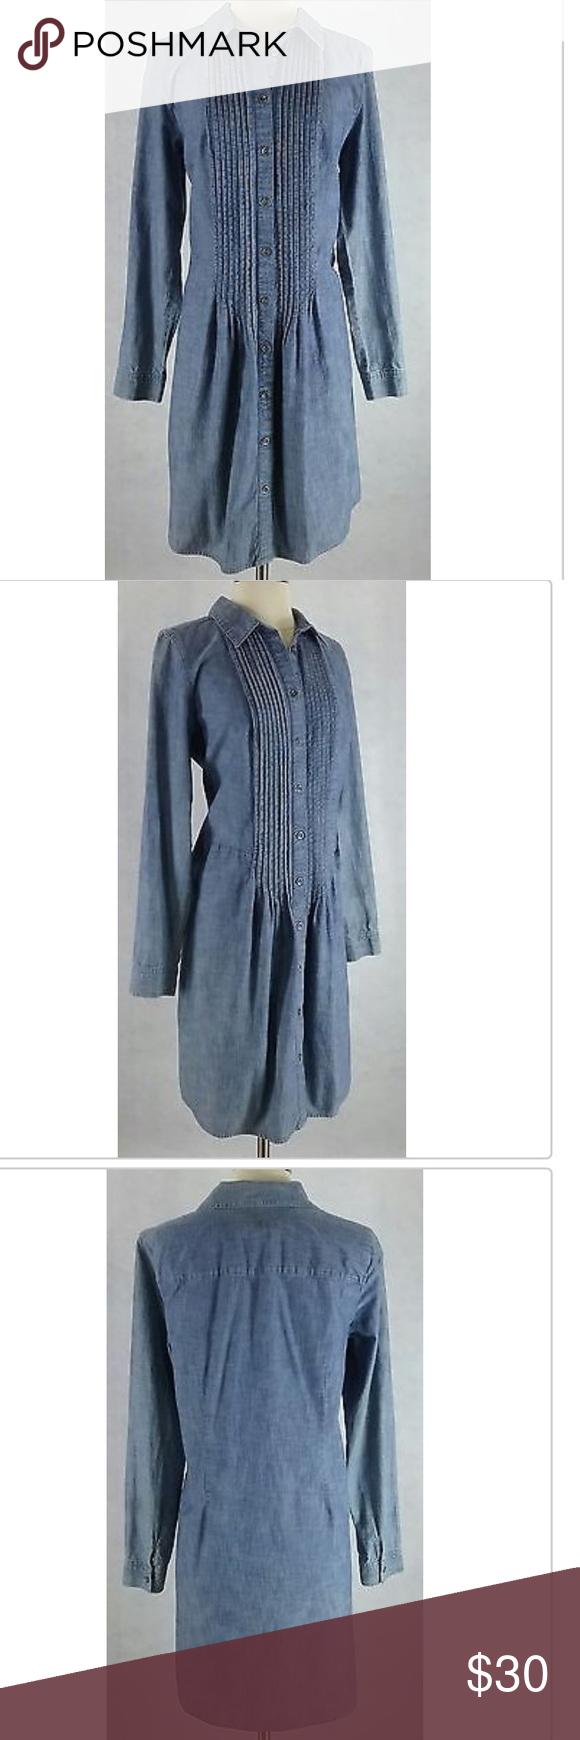 J.Jill Denim dress J.Jill  XSmall Blue Denim Silver Button Pleat Long Sleeve Jean Shirt Dress. 100% Cotton. J. Jill Dresses Long Sleeve